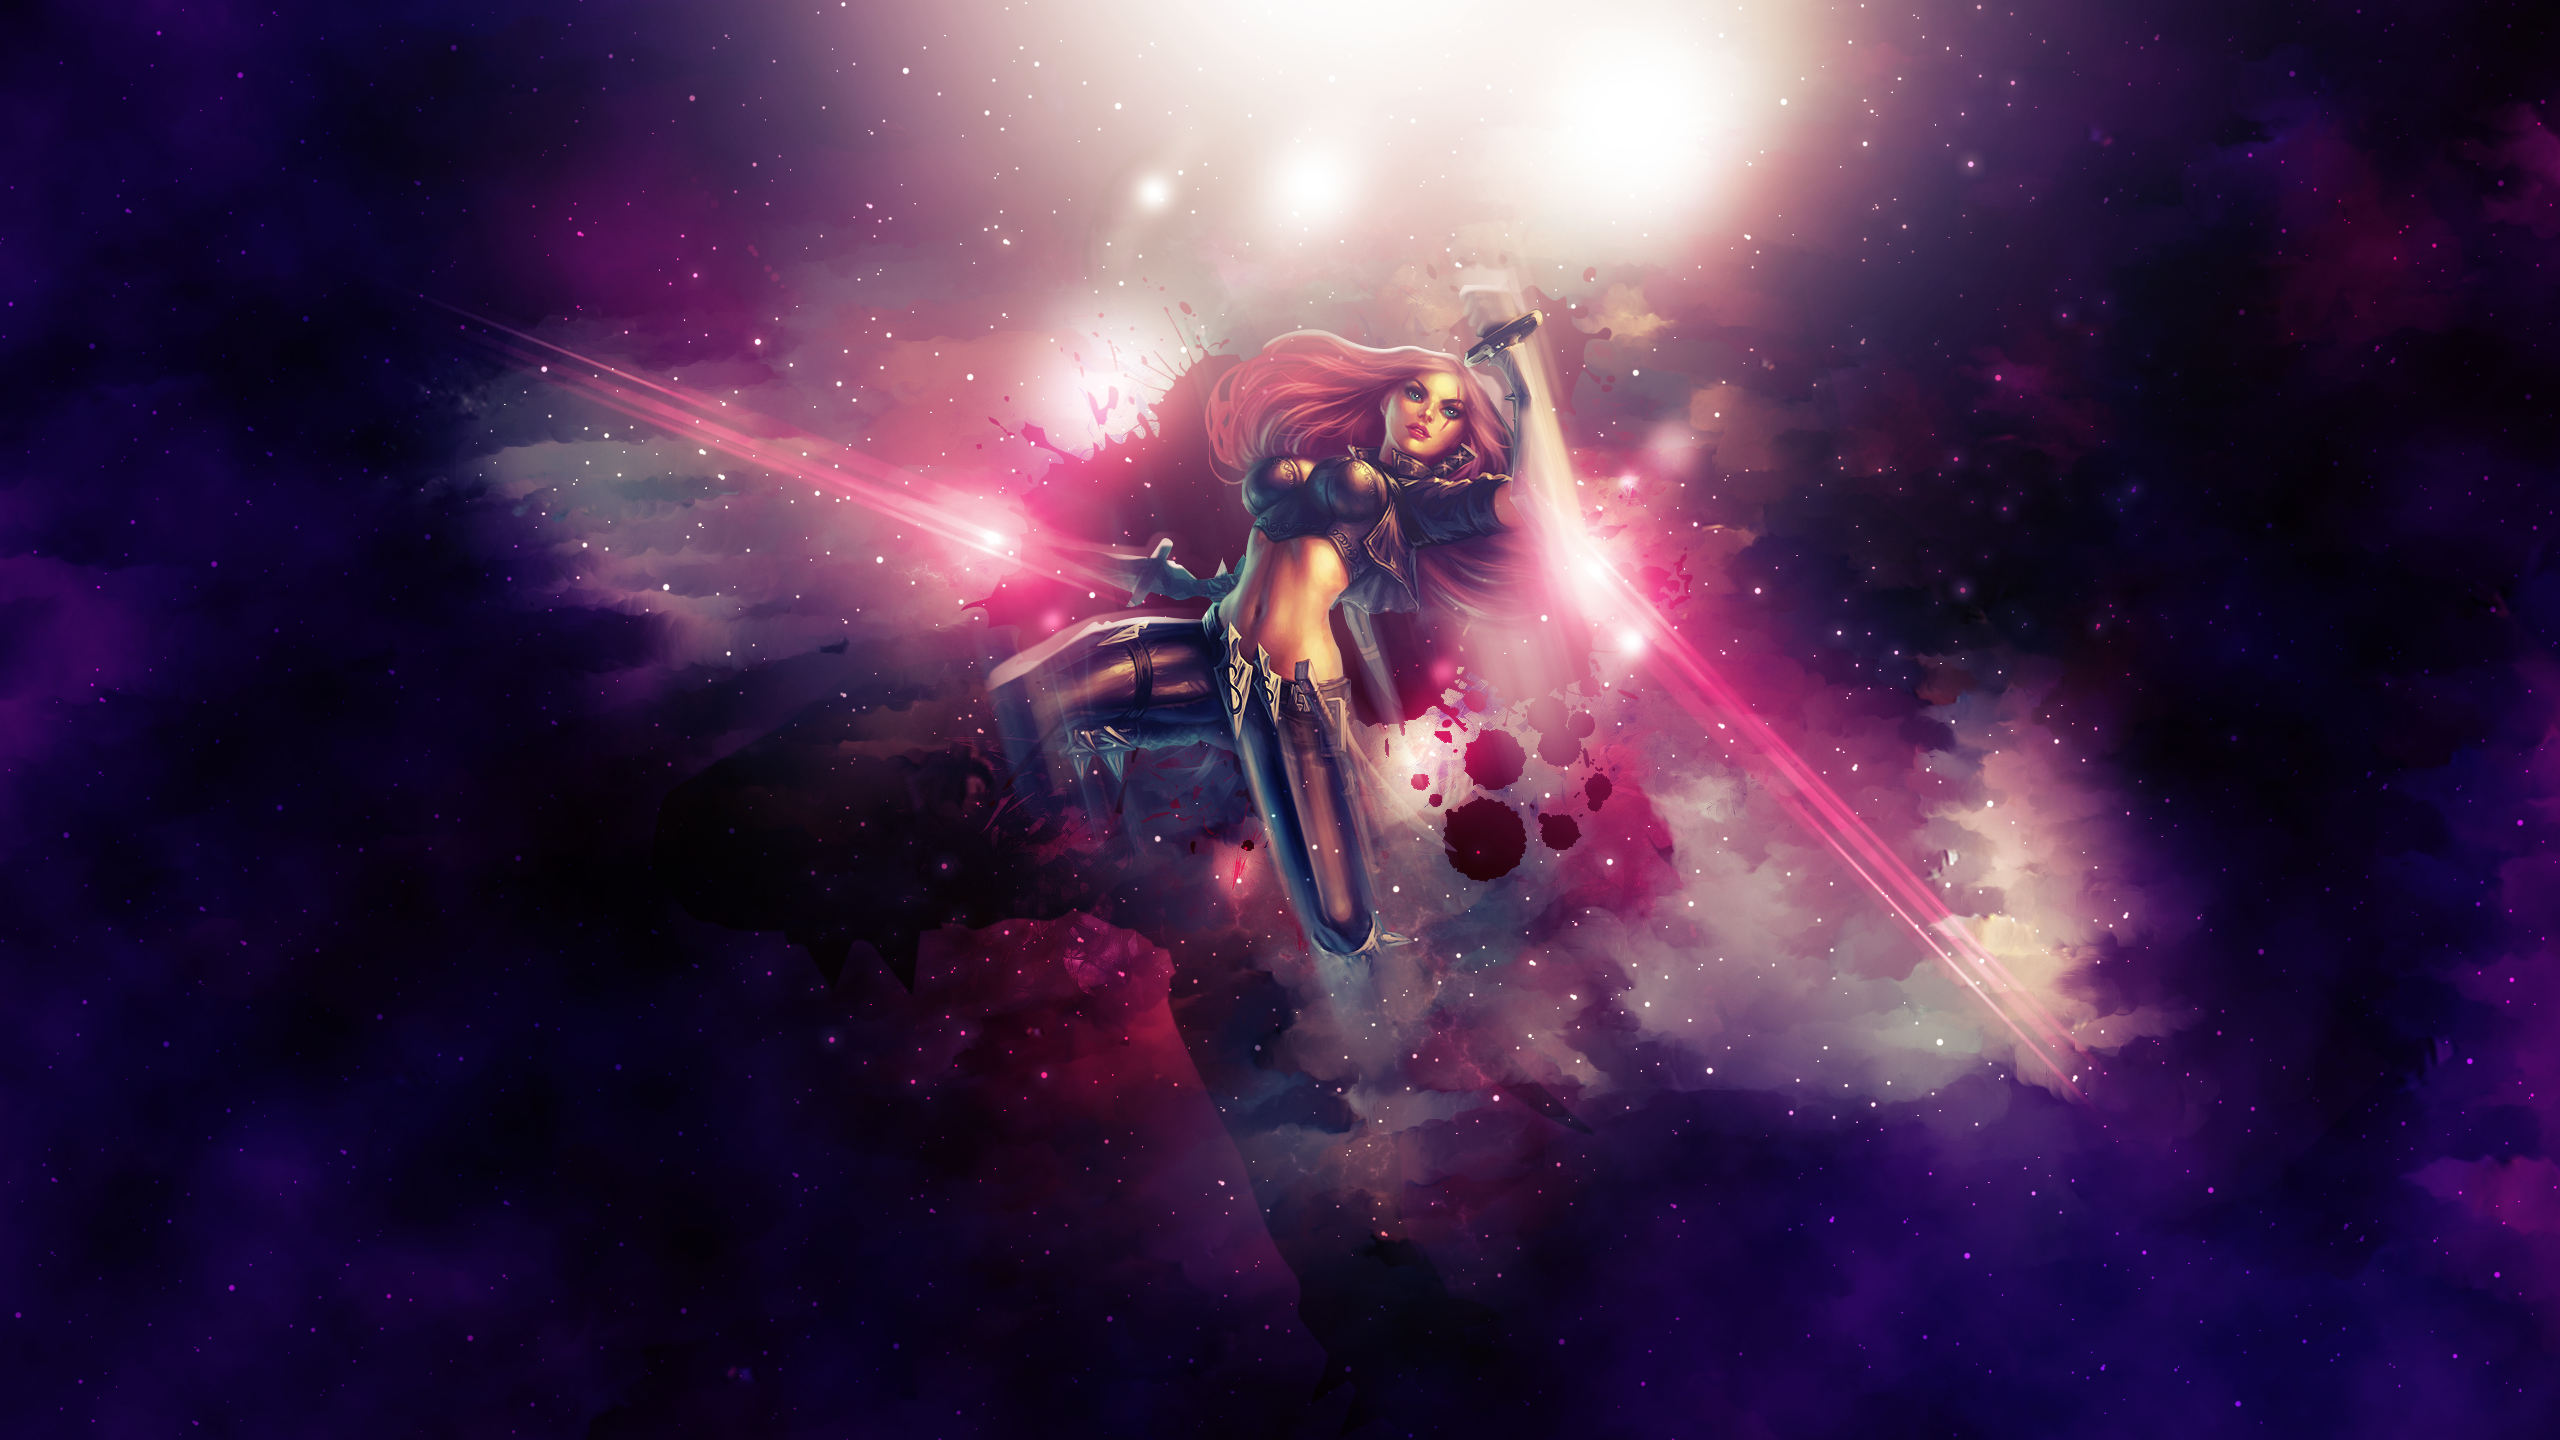 Katarina League Of Legends Wallpaper By Aynoe On Deviantart